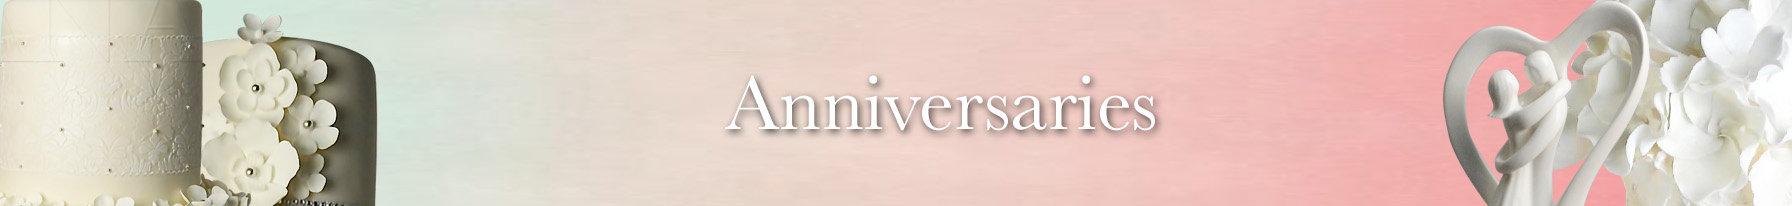 Annniversaries.jpg